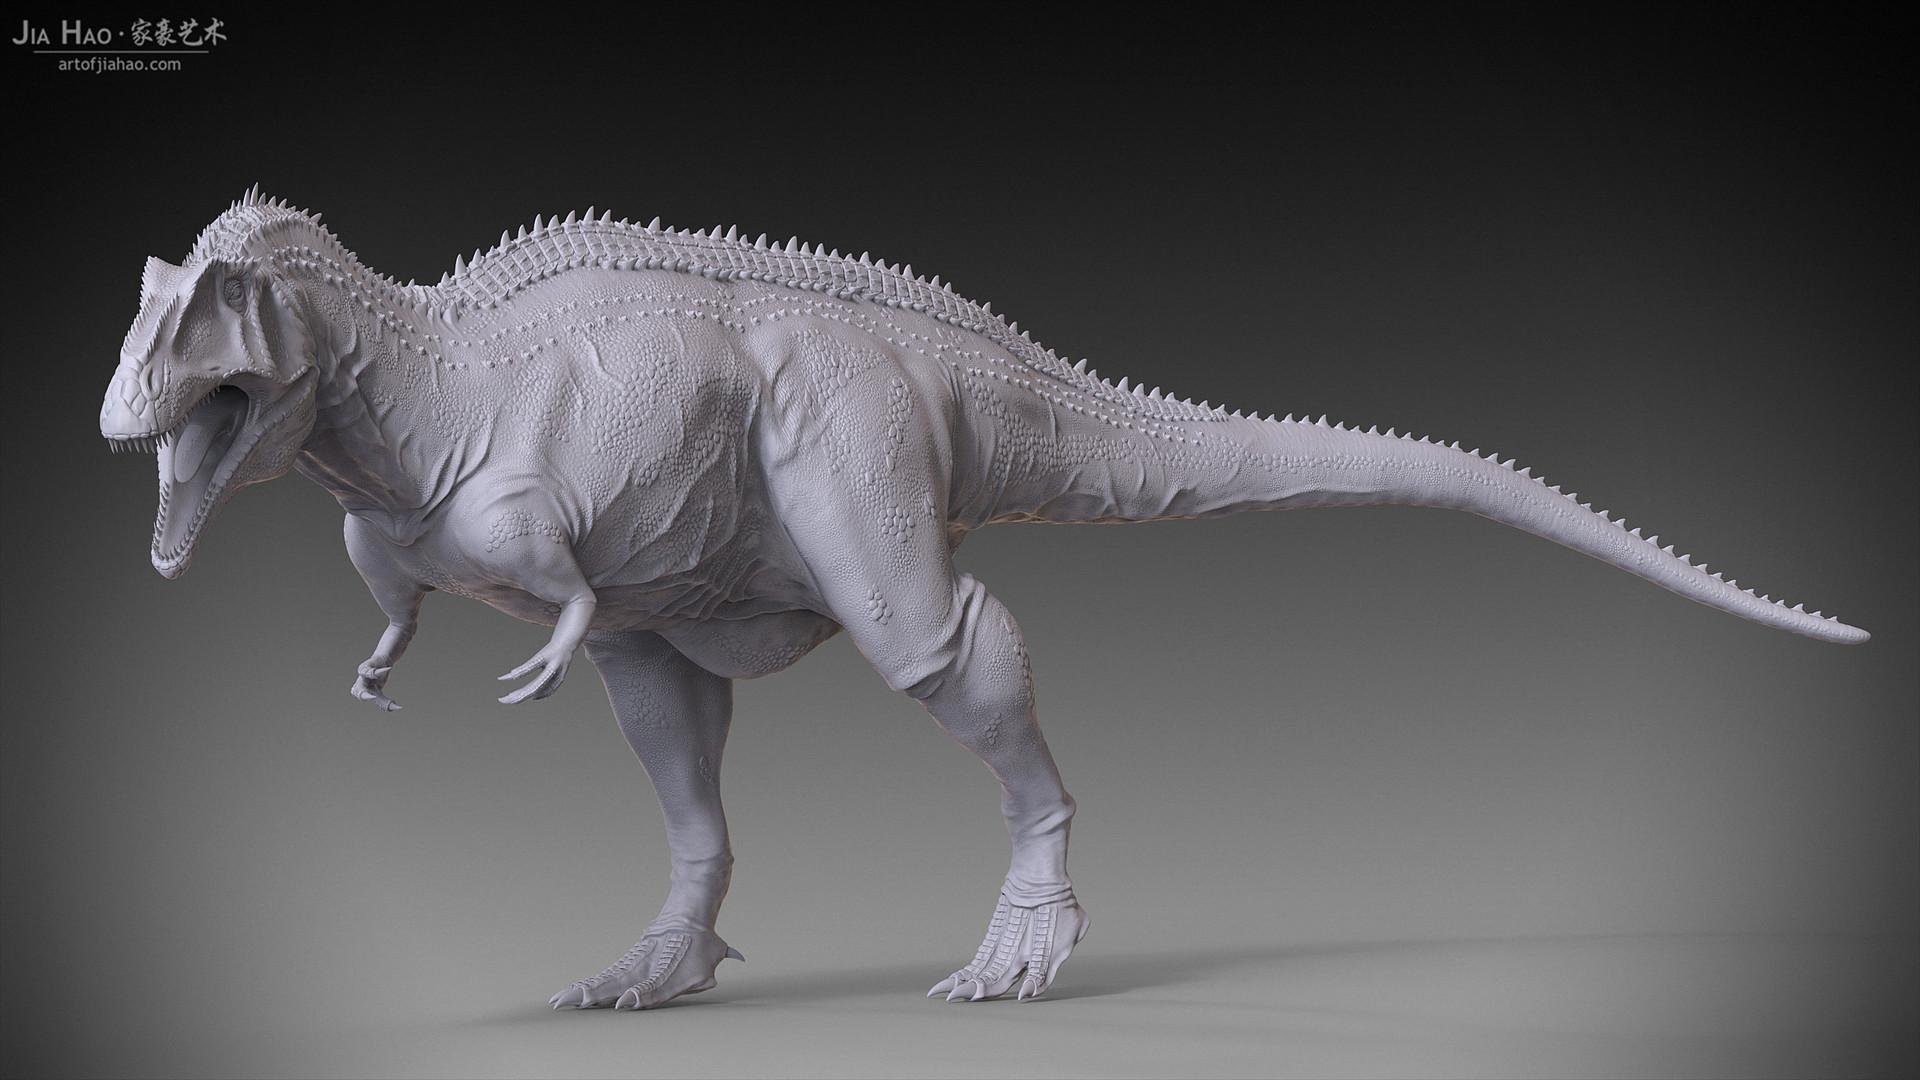 Jia hao acrocanthosaurus 03